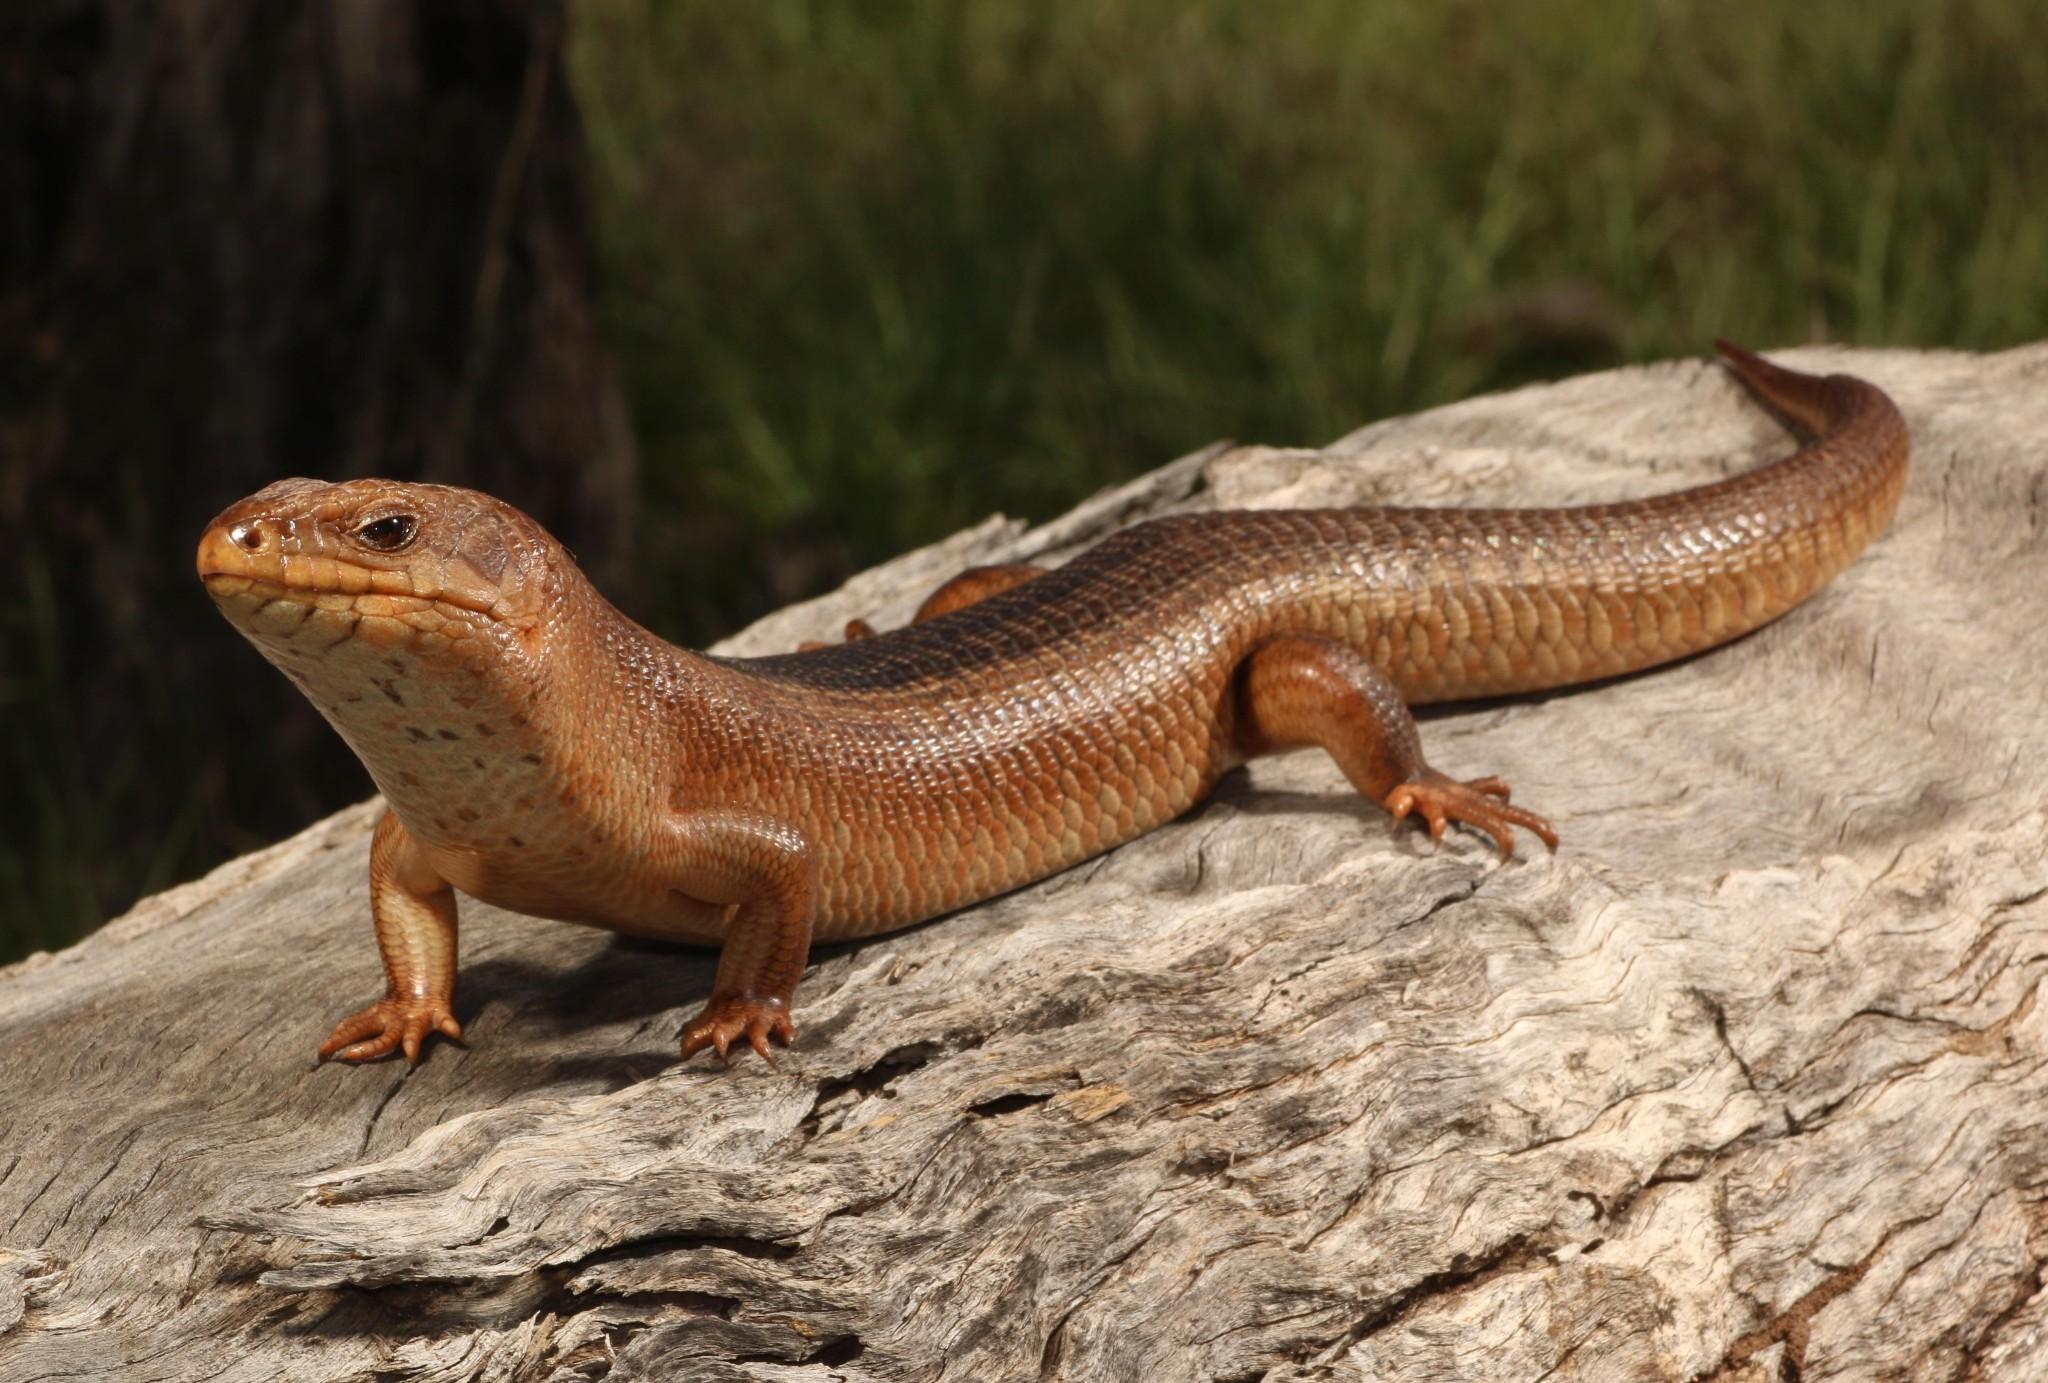 'A national disgrace': Australia's extinction crisis is unfolding in plain sight